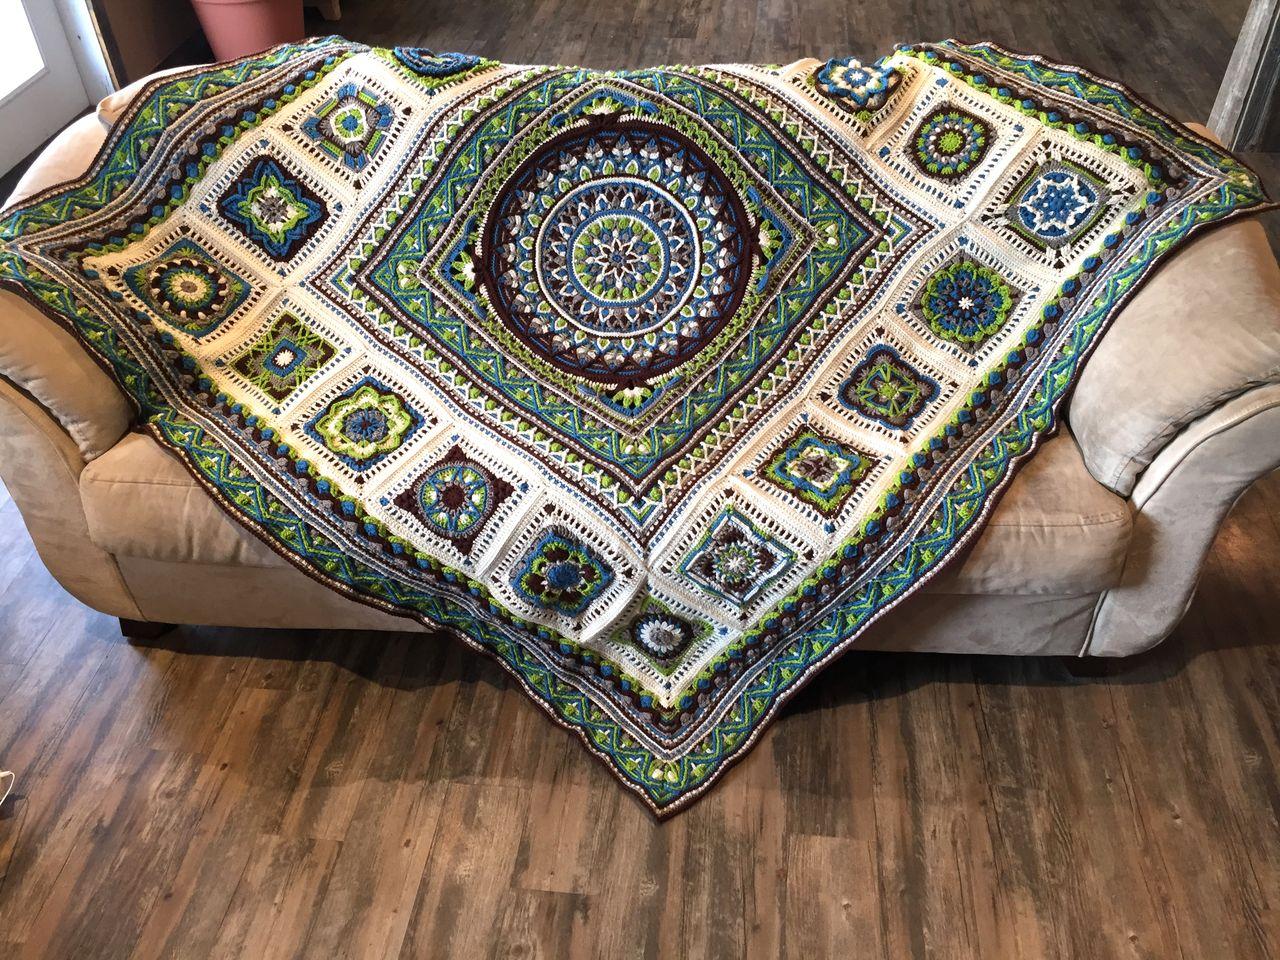 Labyrinth Mandala Blanket (overlay crochet)